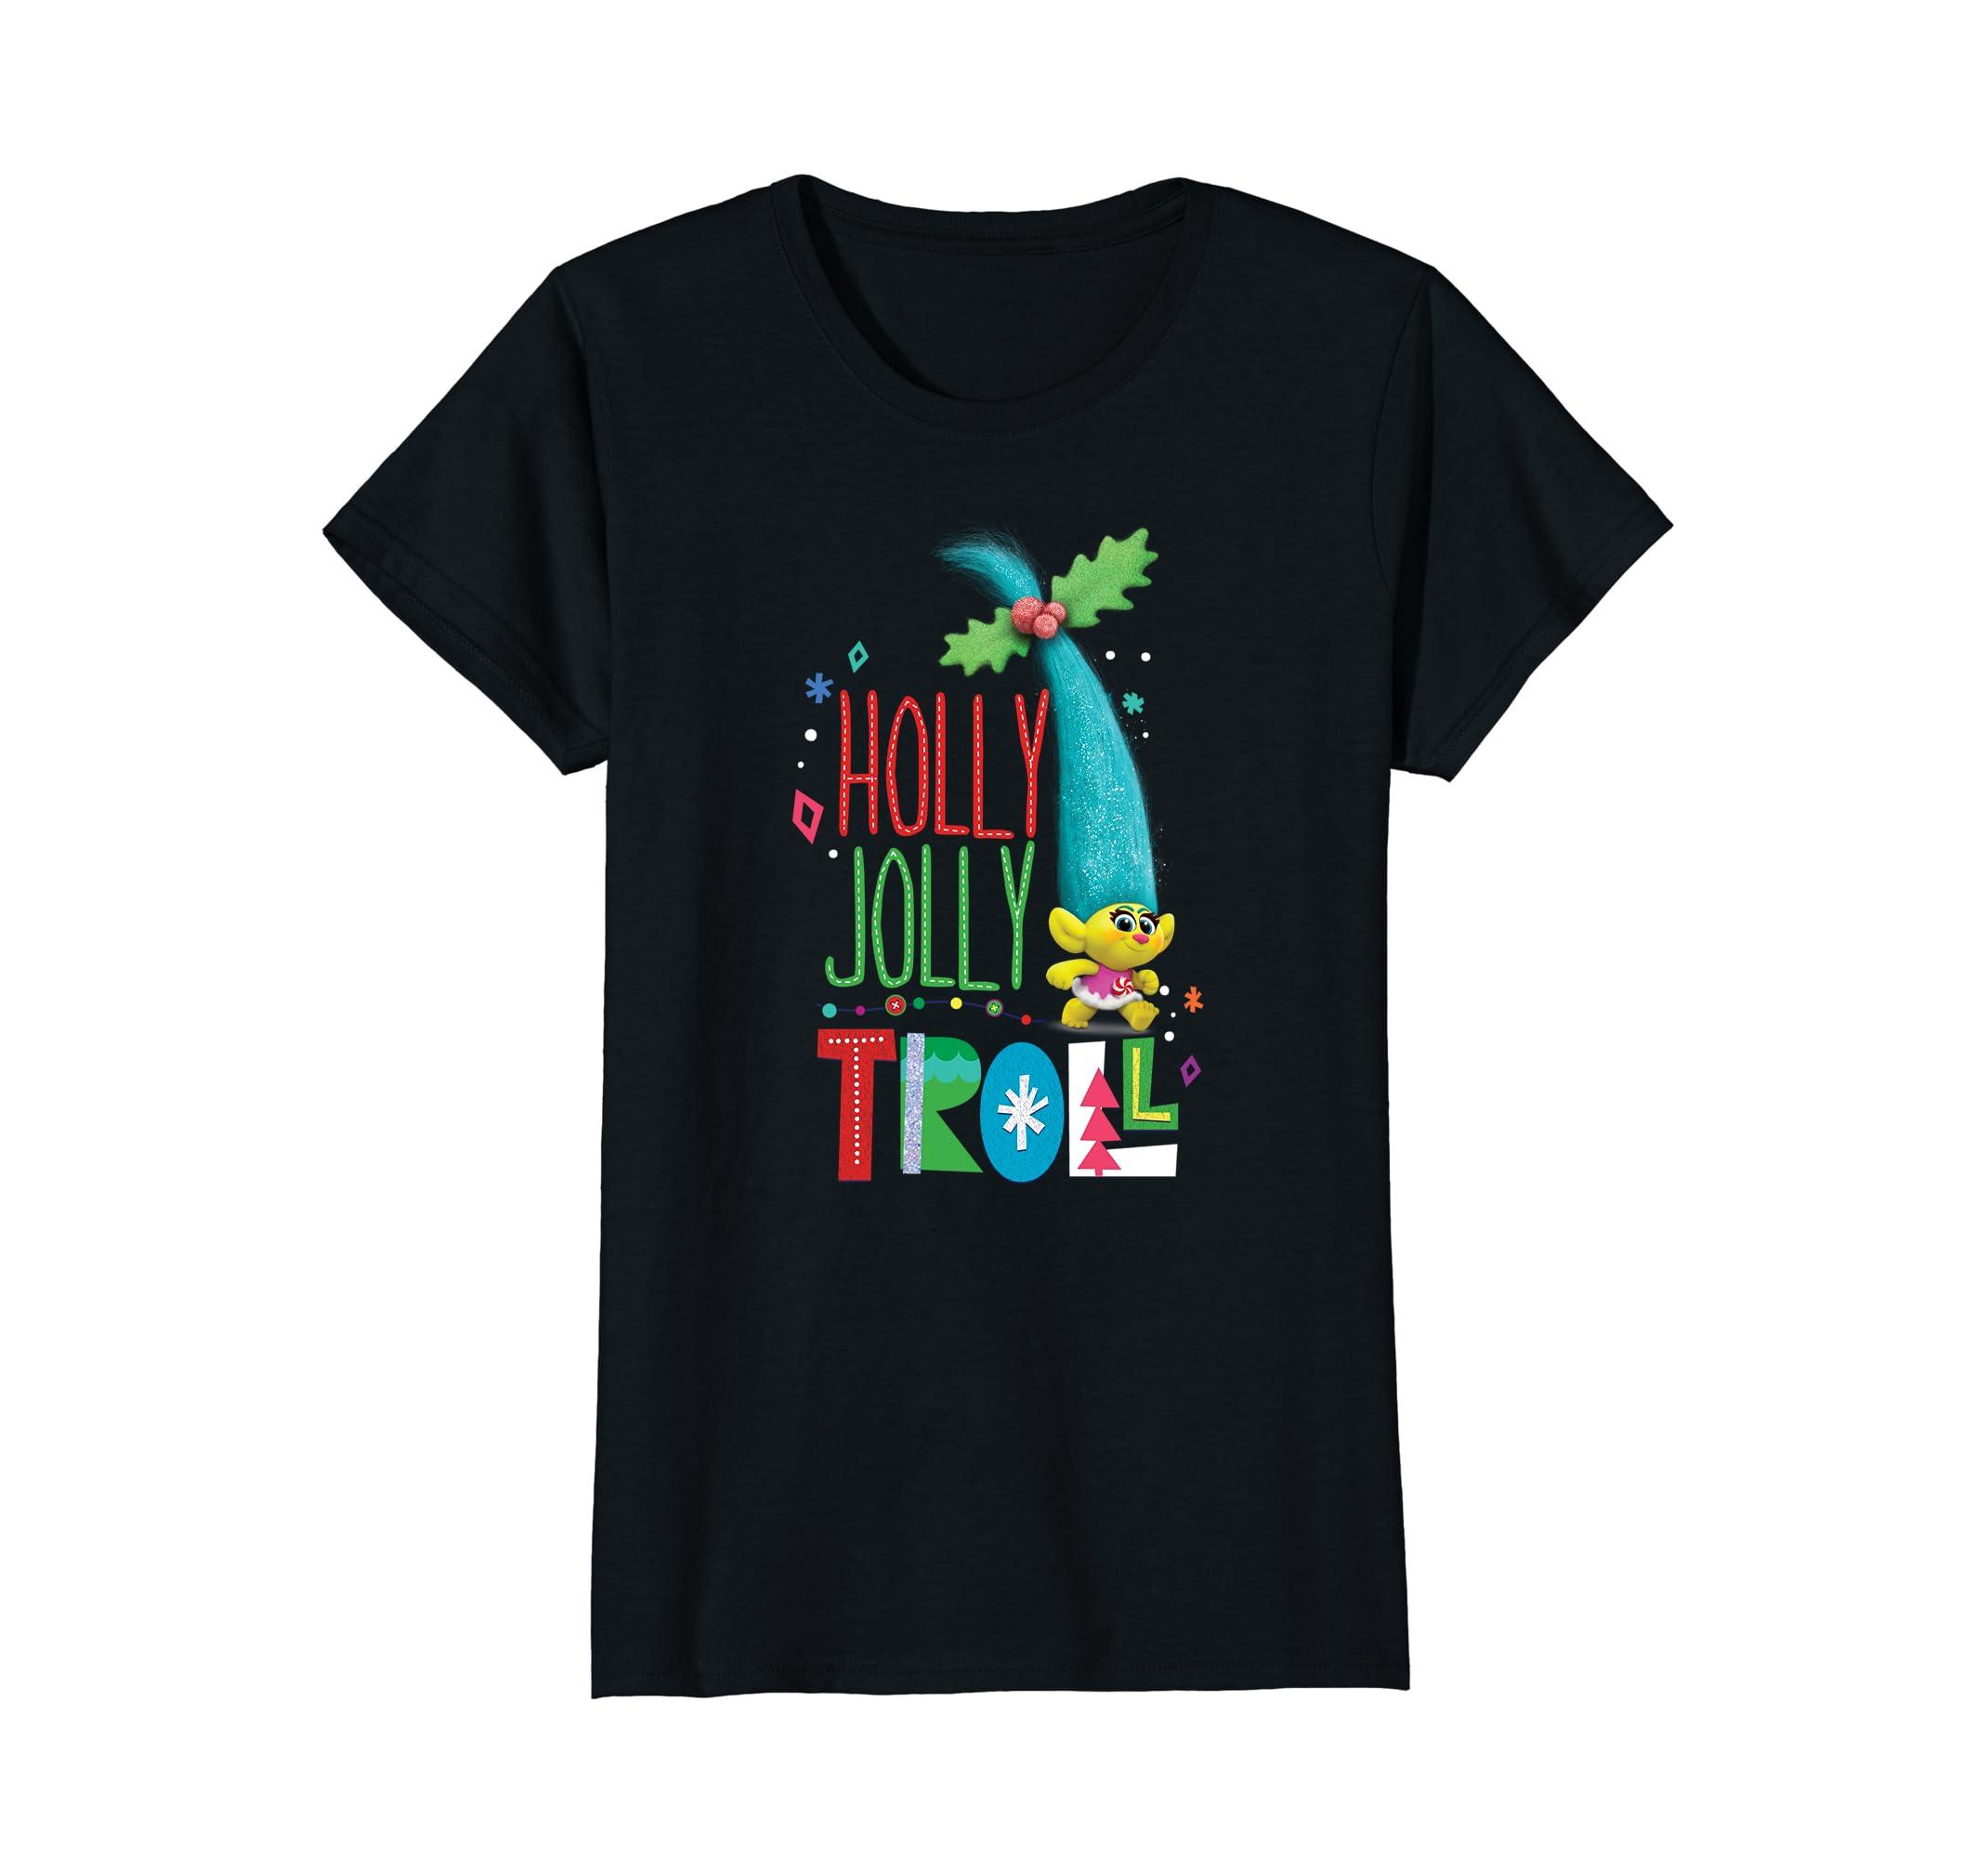 d664f844e Amazon.com: DreamWorks' Trolls Holly Jolly Troll Holiday T-Shirt: Clothing